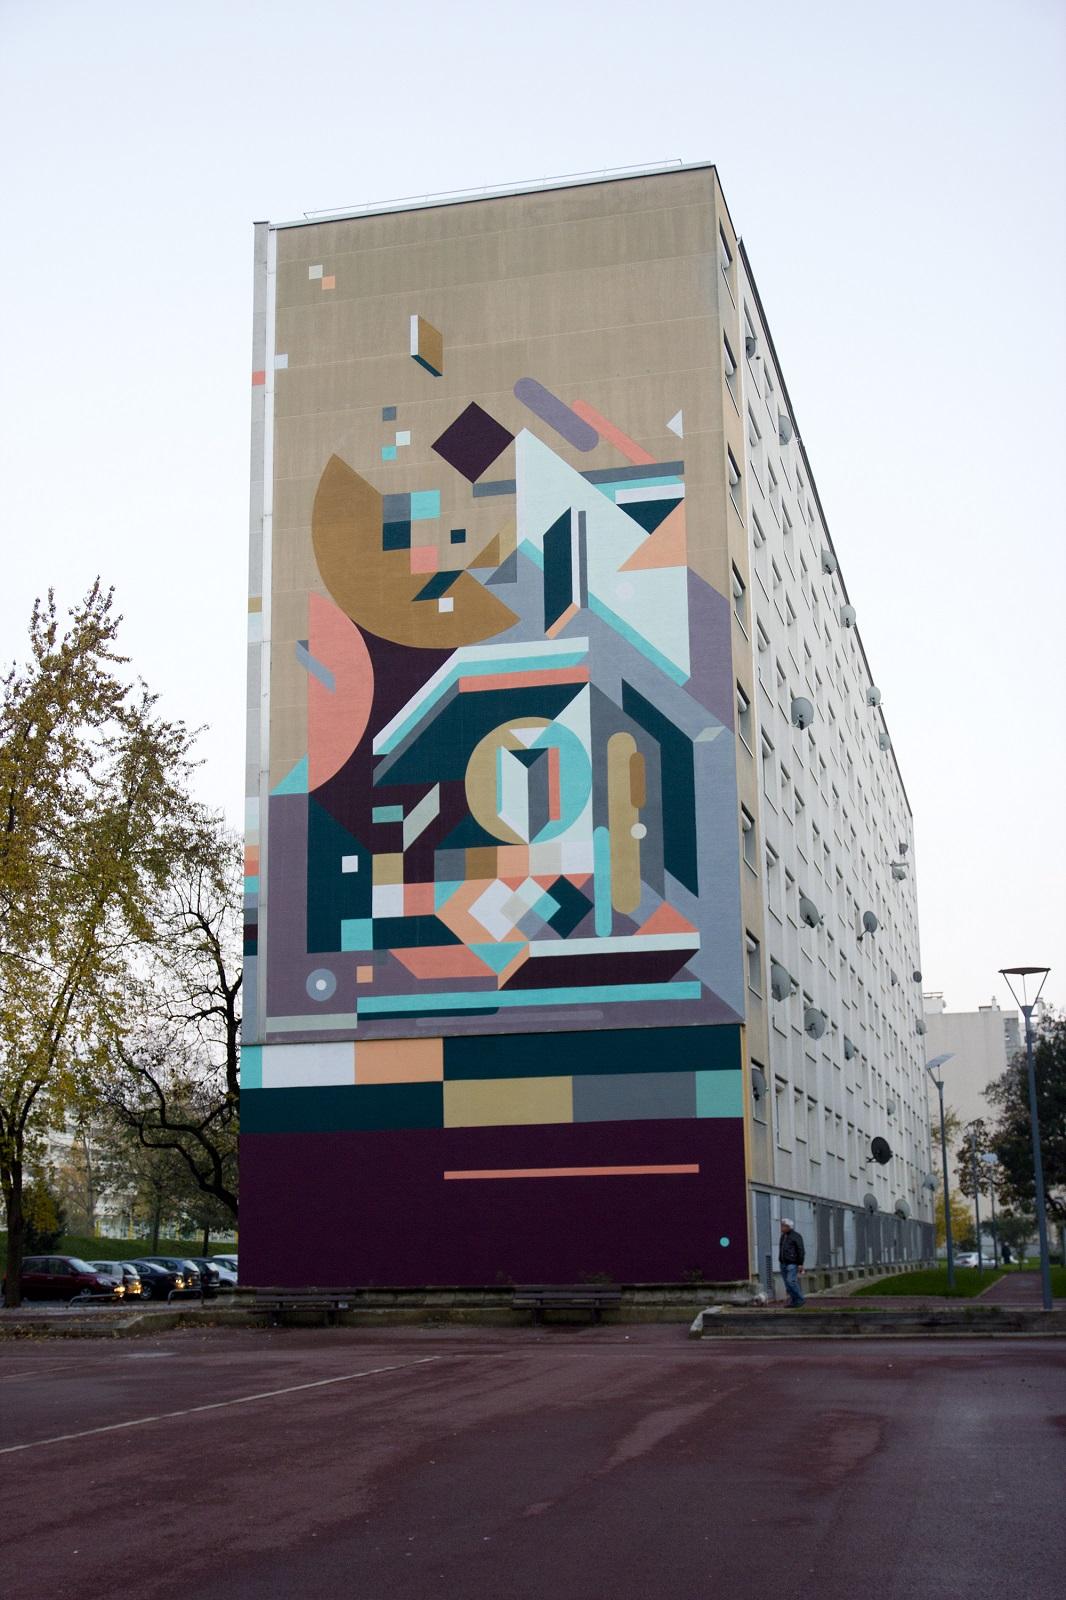 nelio-for-mosaique-urbaine-in-venissieux-france-02